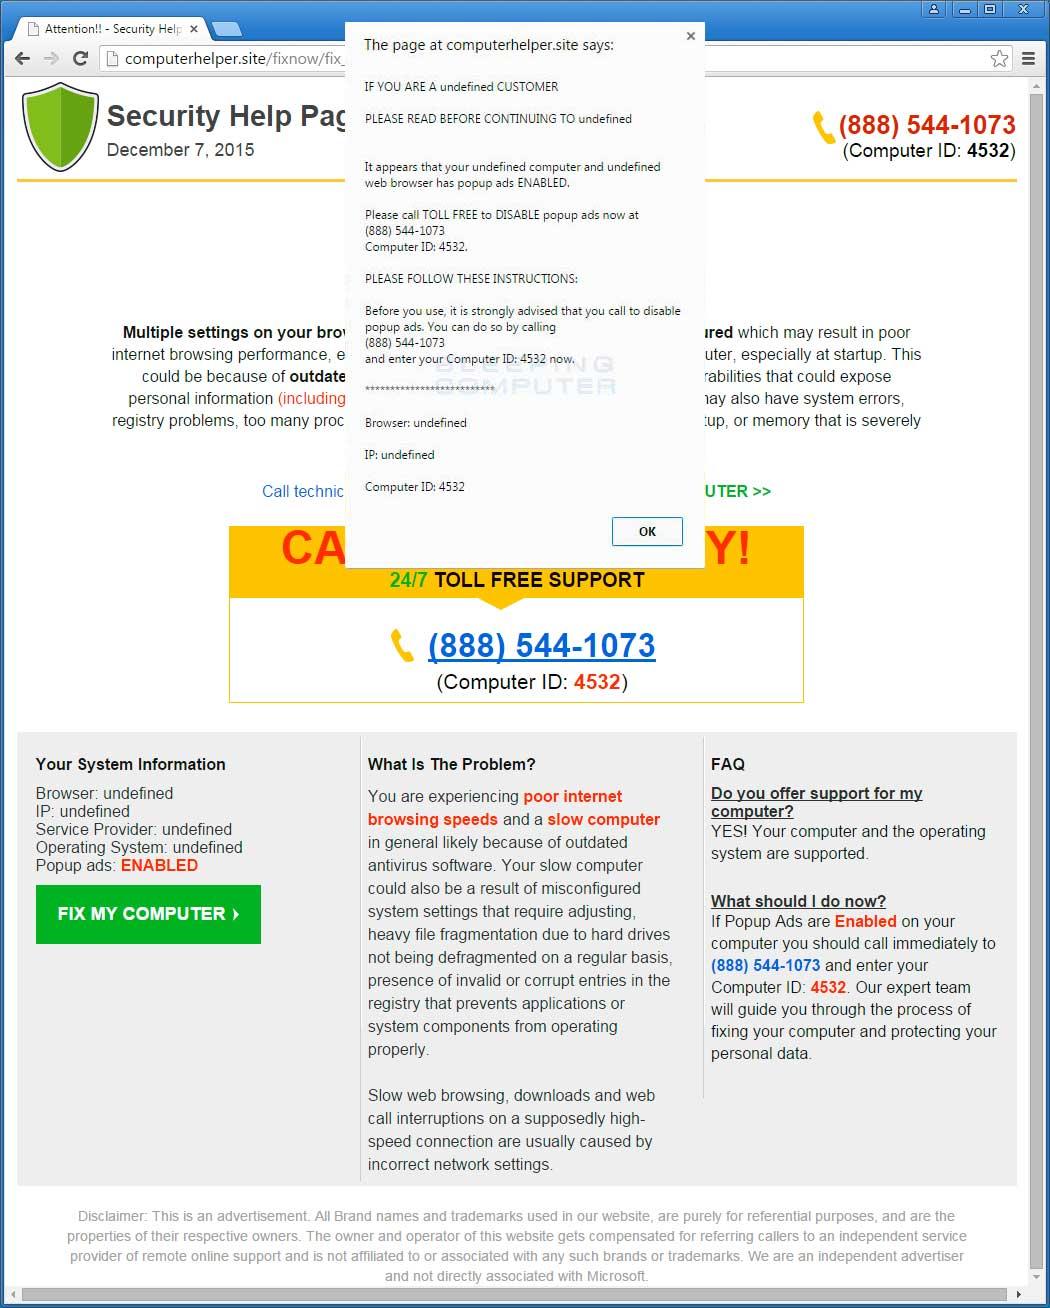 Fake Security Alert from Computerhelper.site